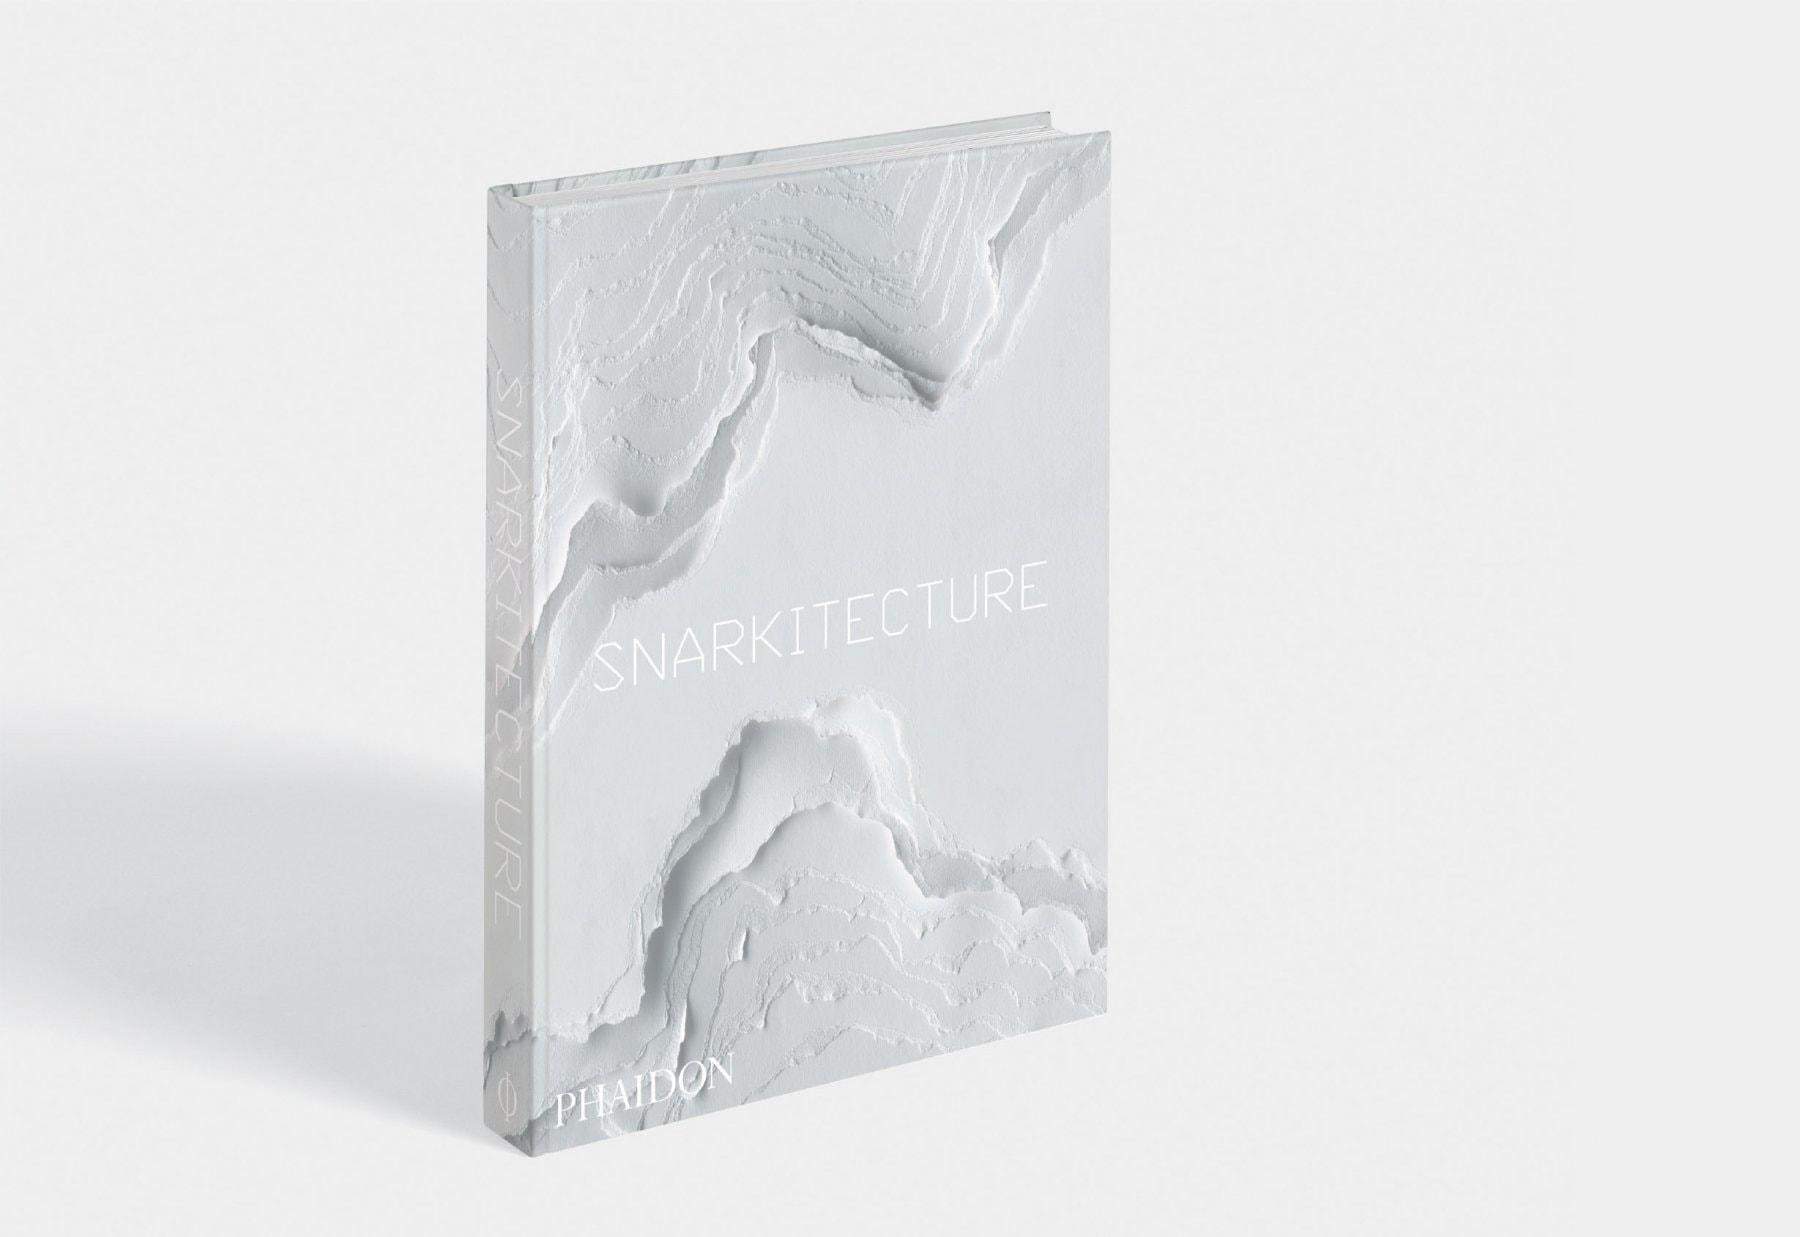 Snarkitecture - minimalismo